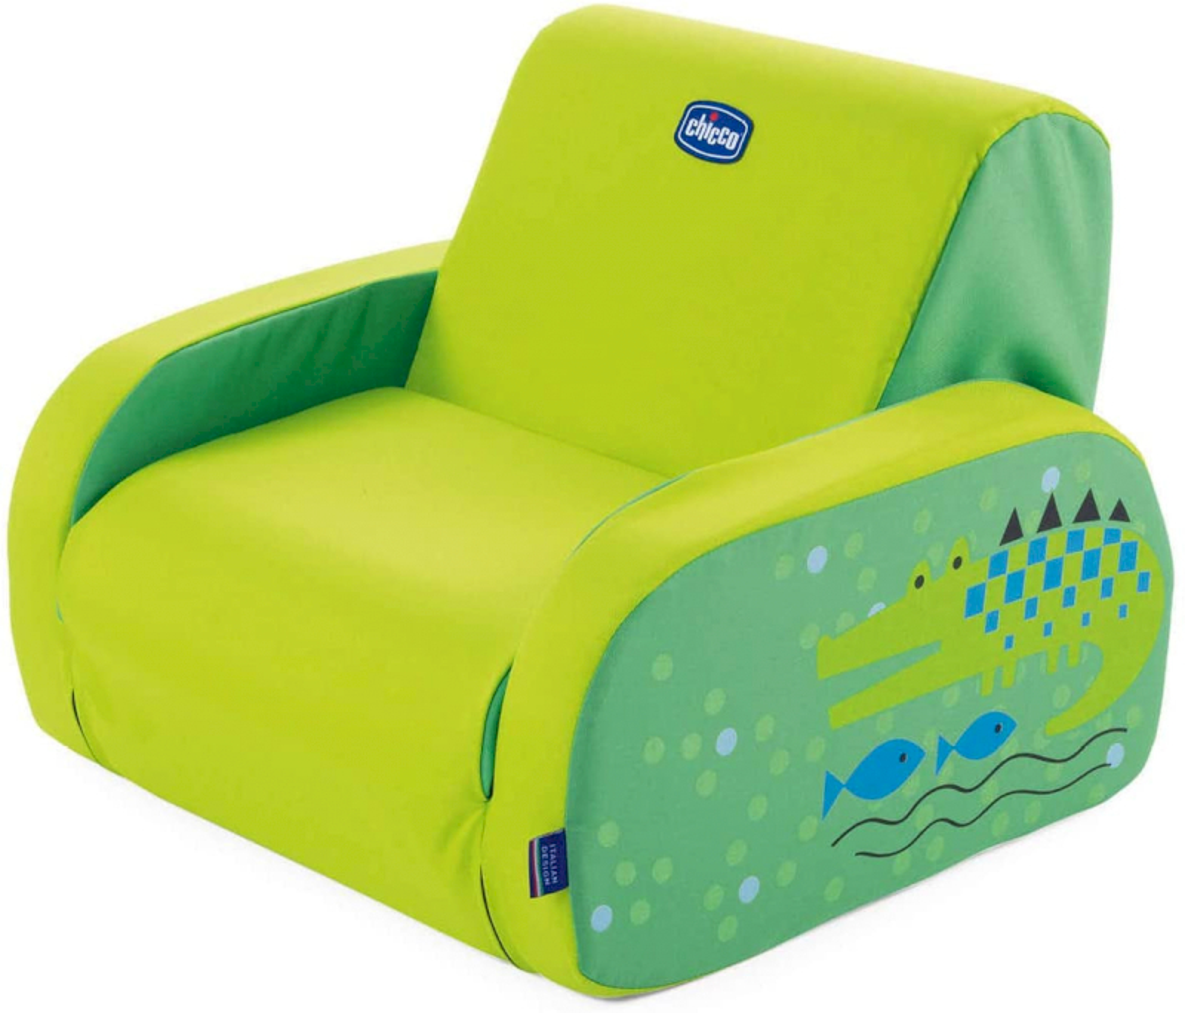 Chicco Babysessel Twist Summer Green